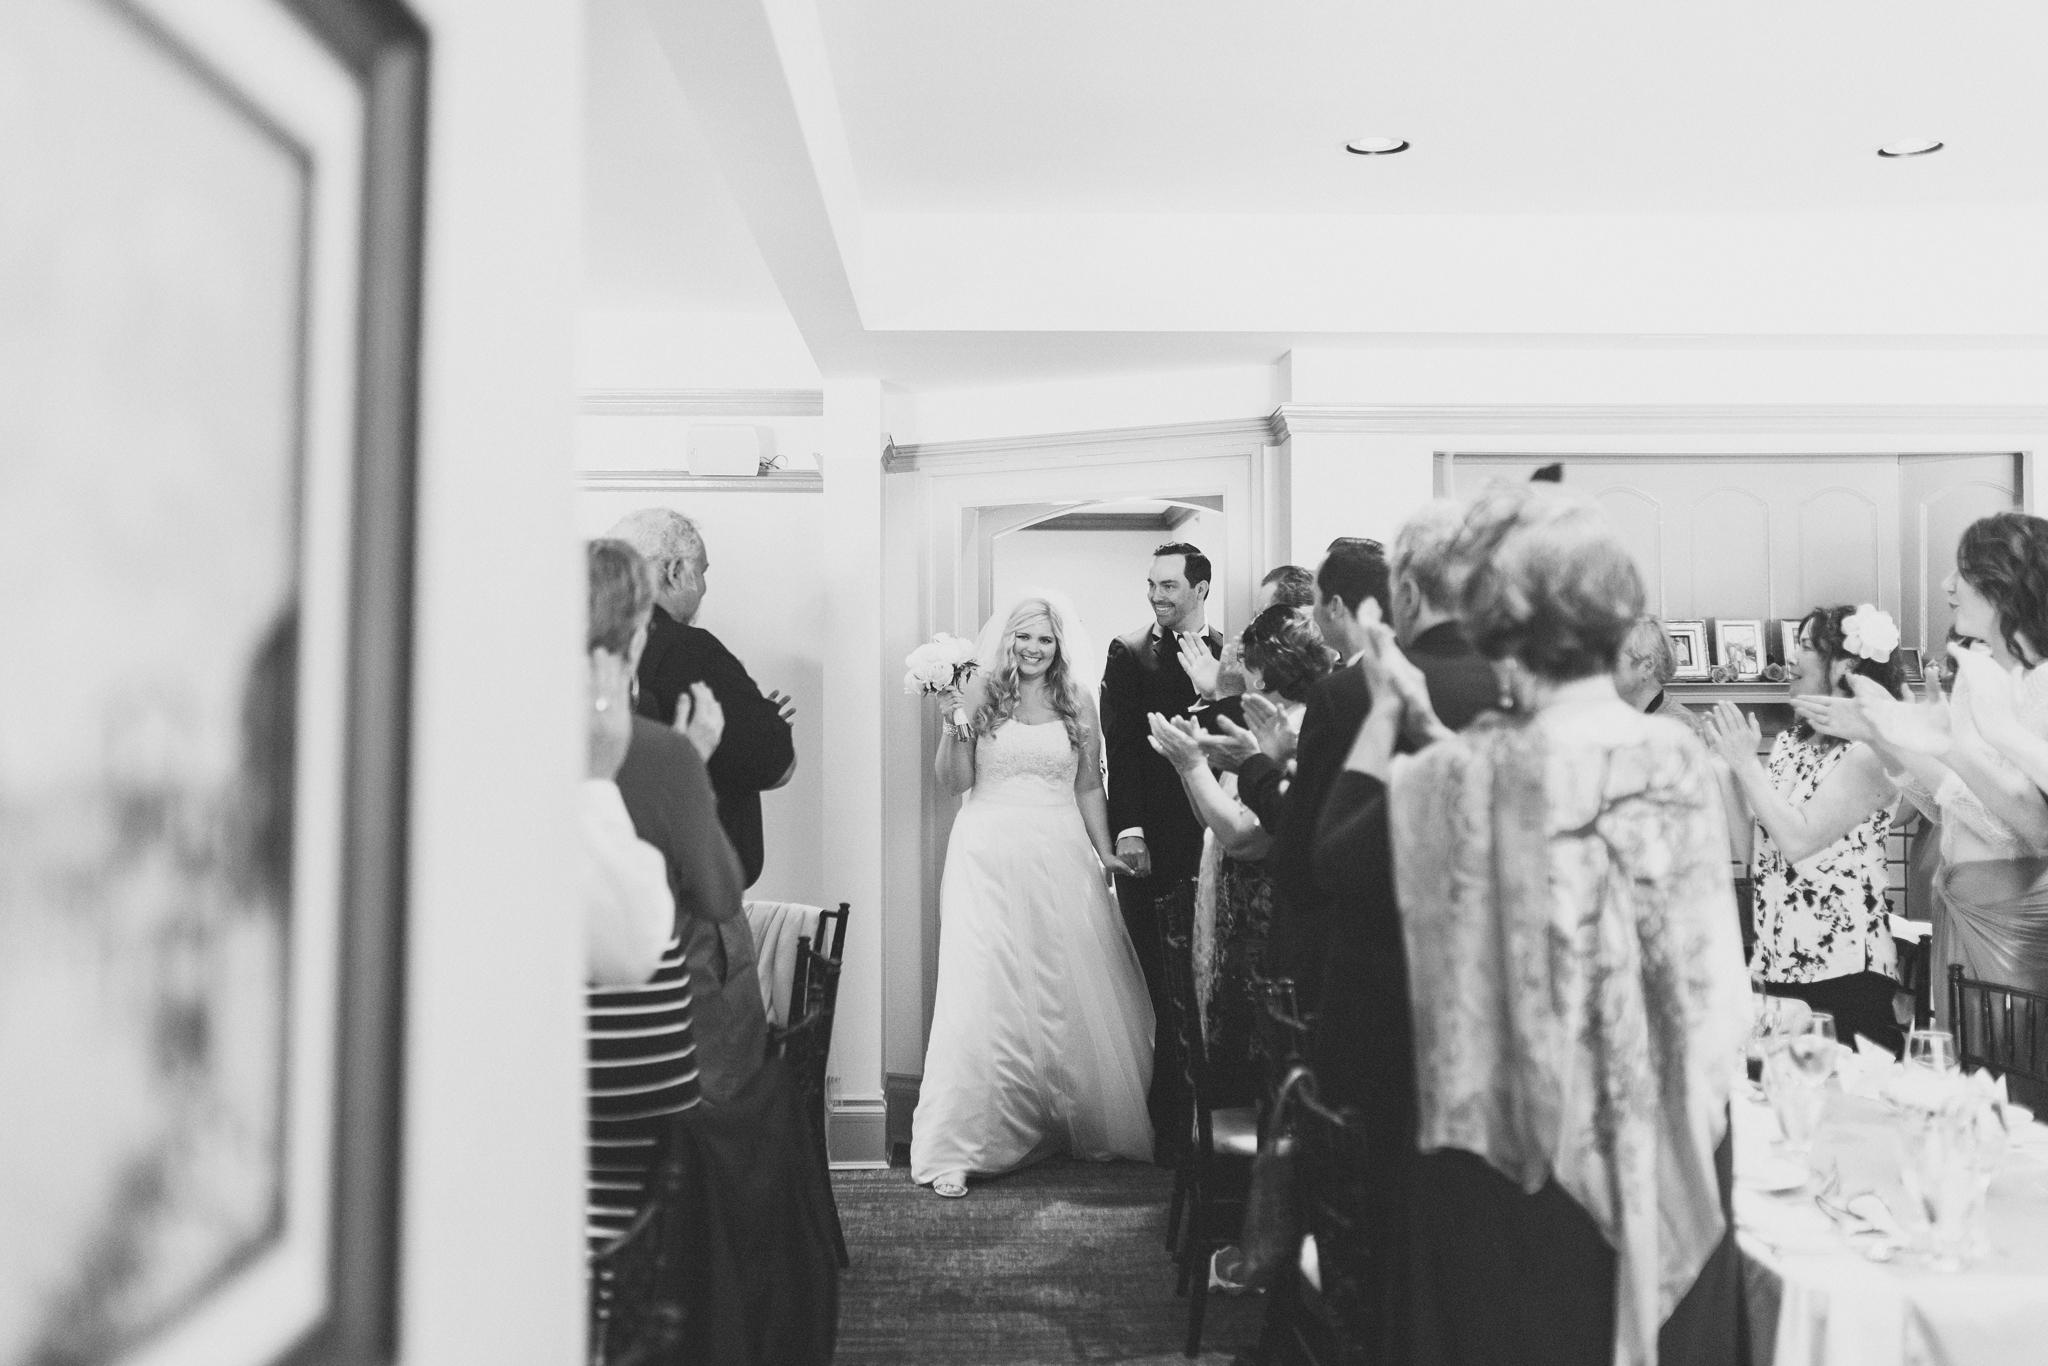 IMG_6750-VANCOUVER-WEDDING-PHOTOGRAPHER-JENNIFER-PICARD-PHOTOGRAPHY.jpg